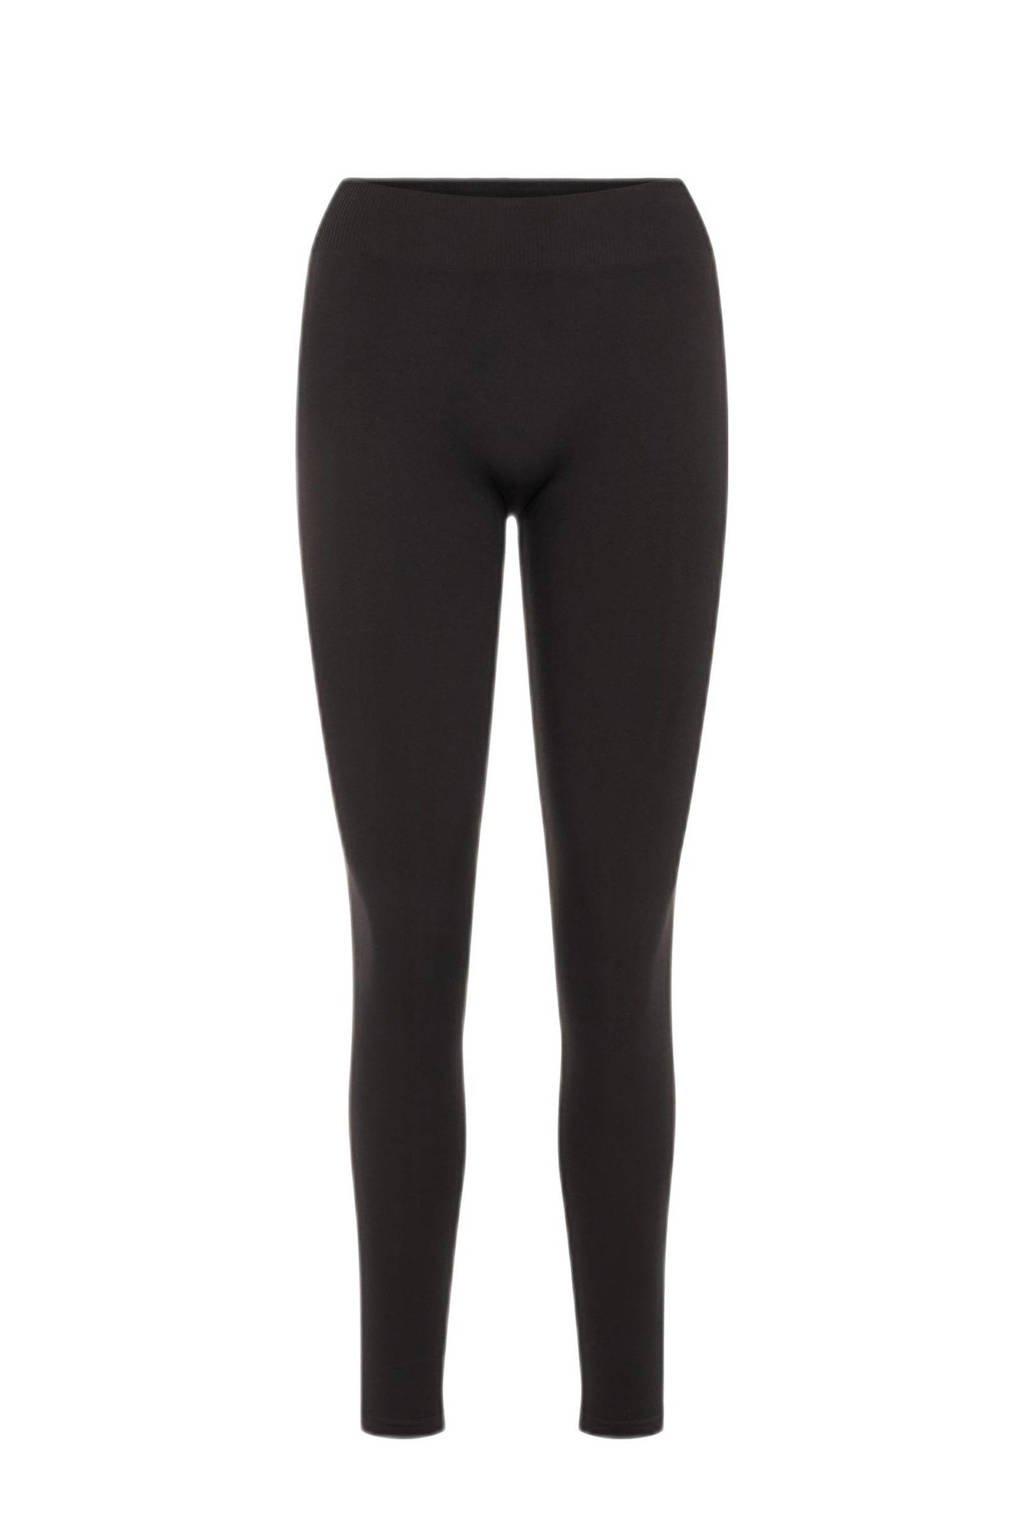 PIECES legging Basics zwart, Zwart